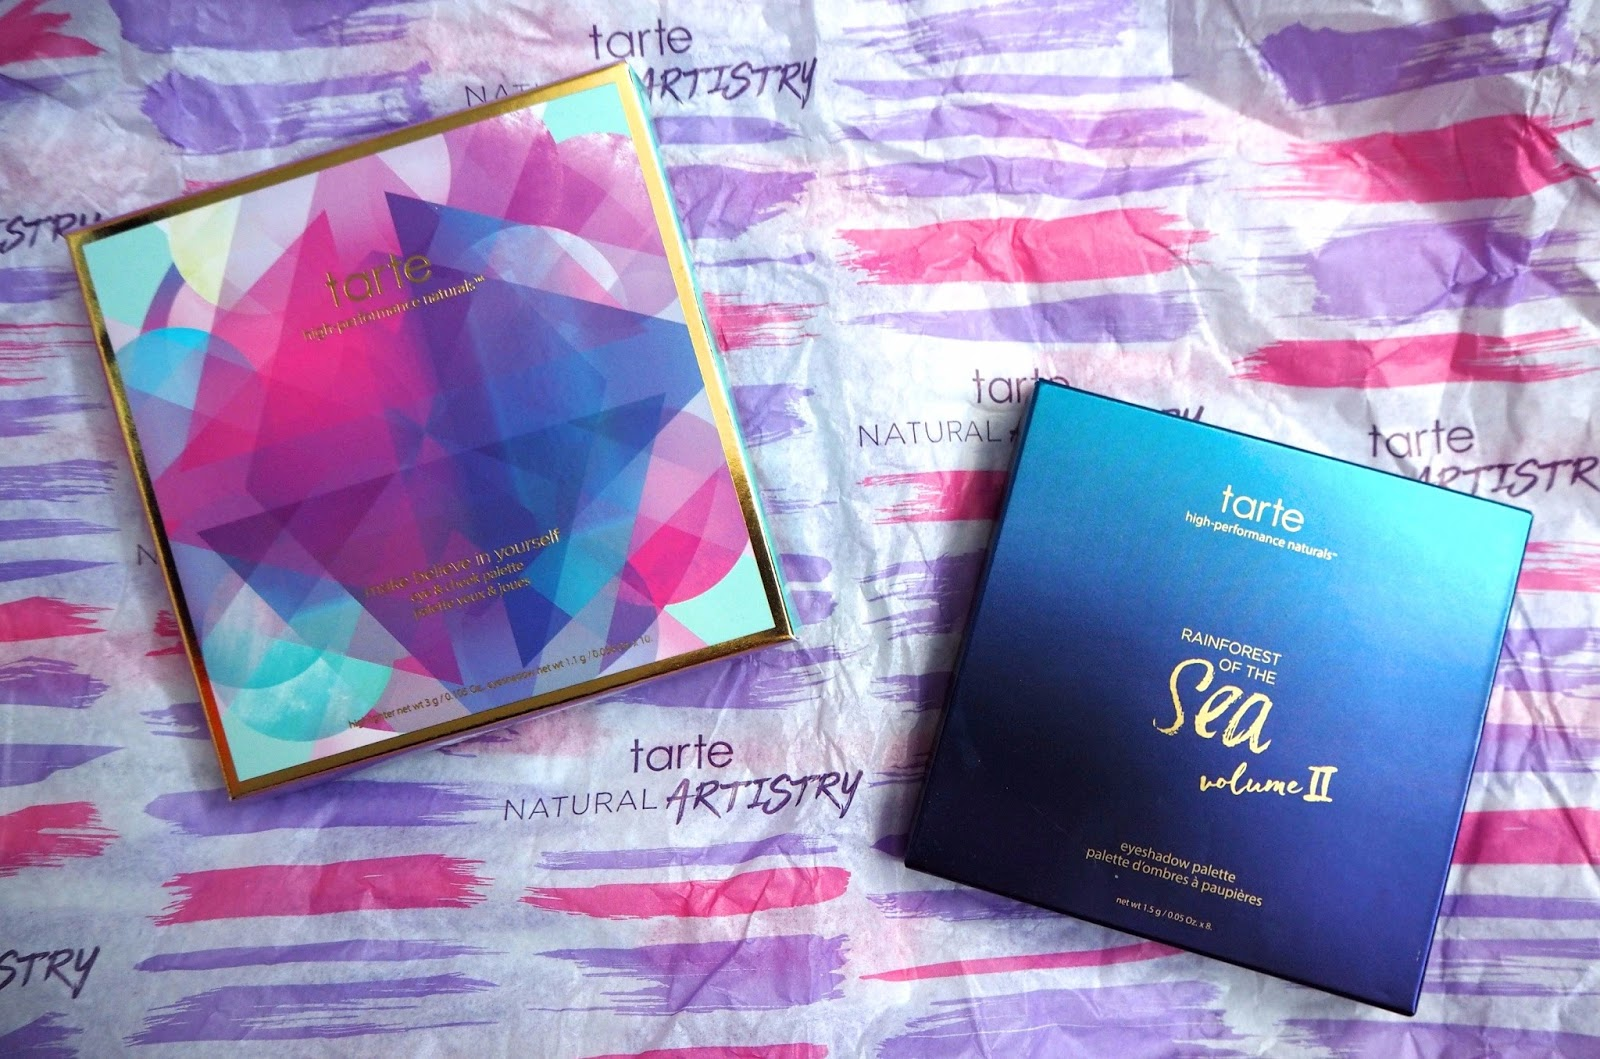 Tarte Cosmetics Packaging